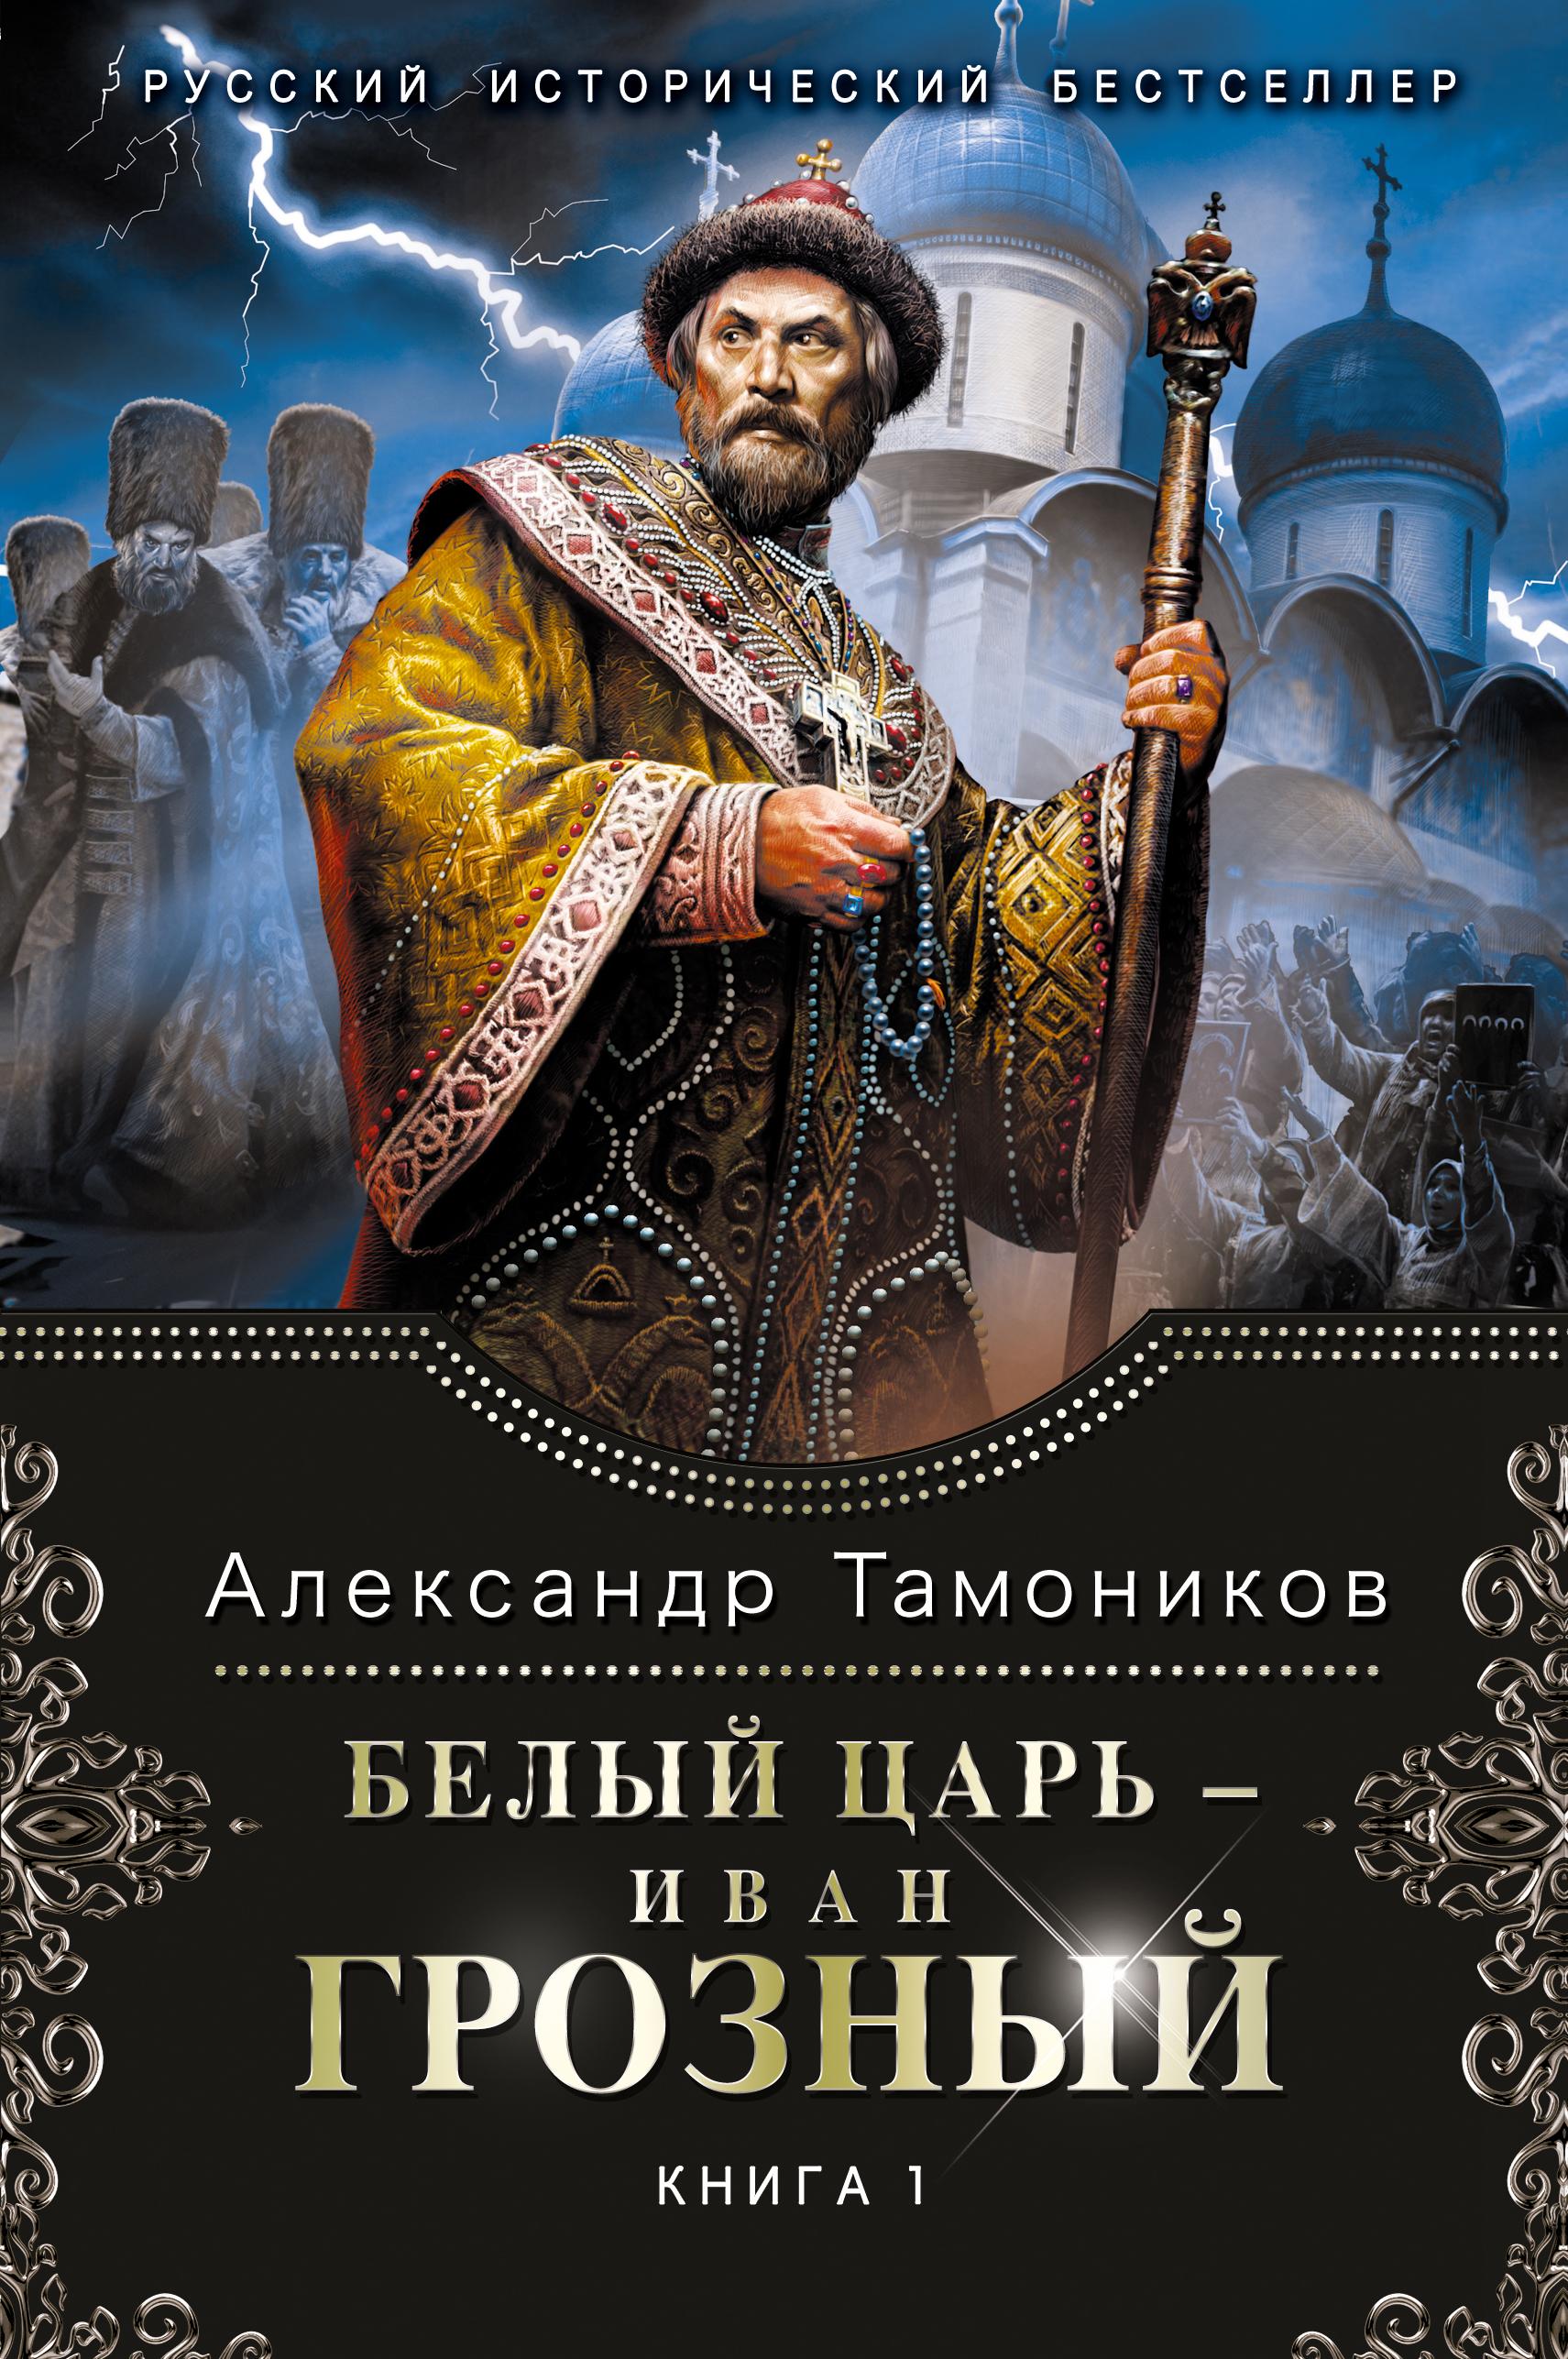 Белый царь – Иван Грозный. Книга 1